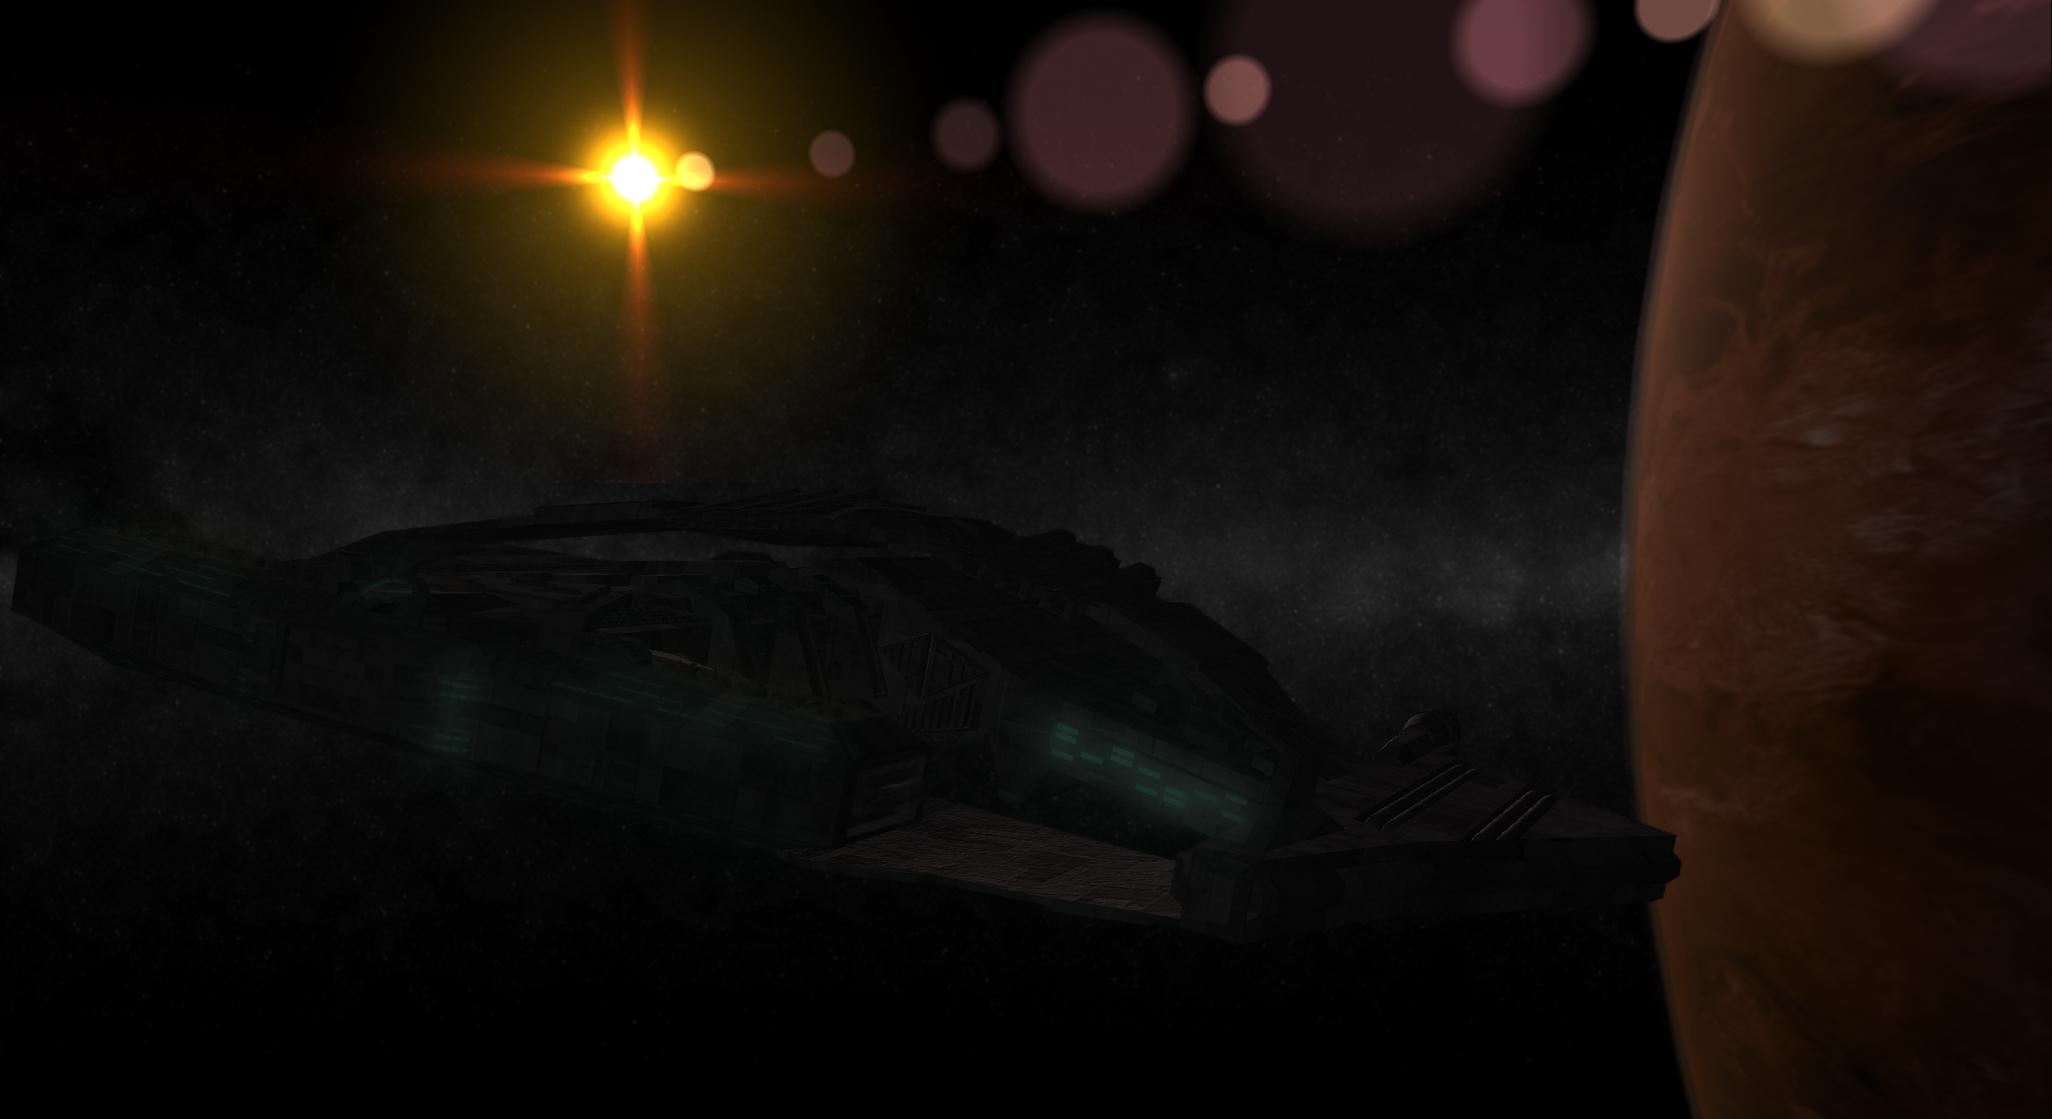 Battlecruiser Husky Leaving Orbit by connorz16